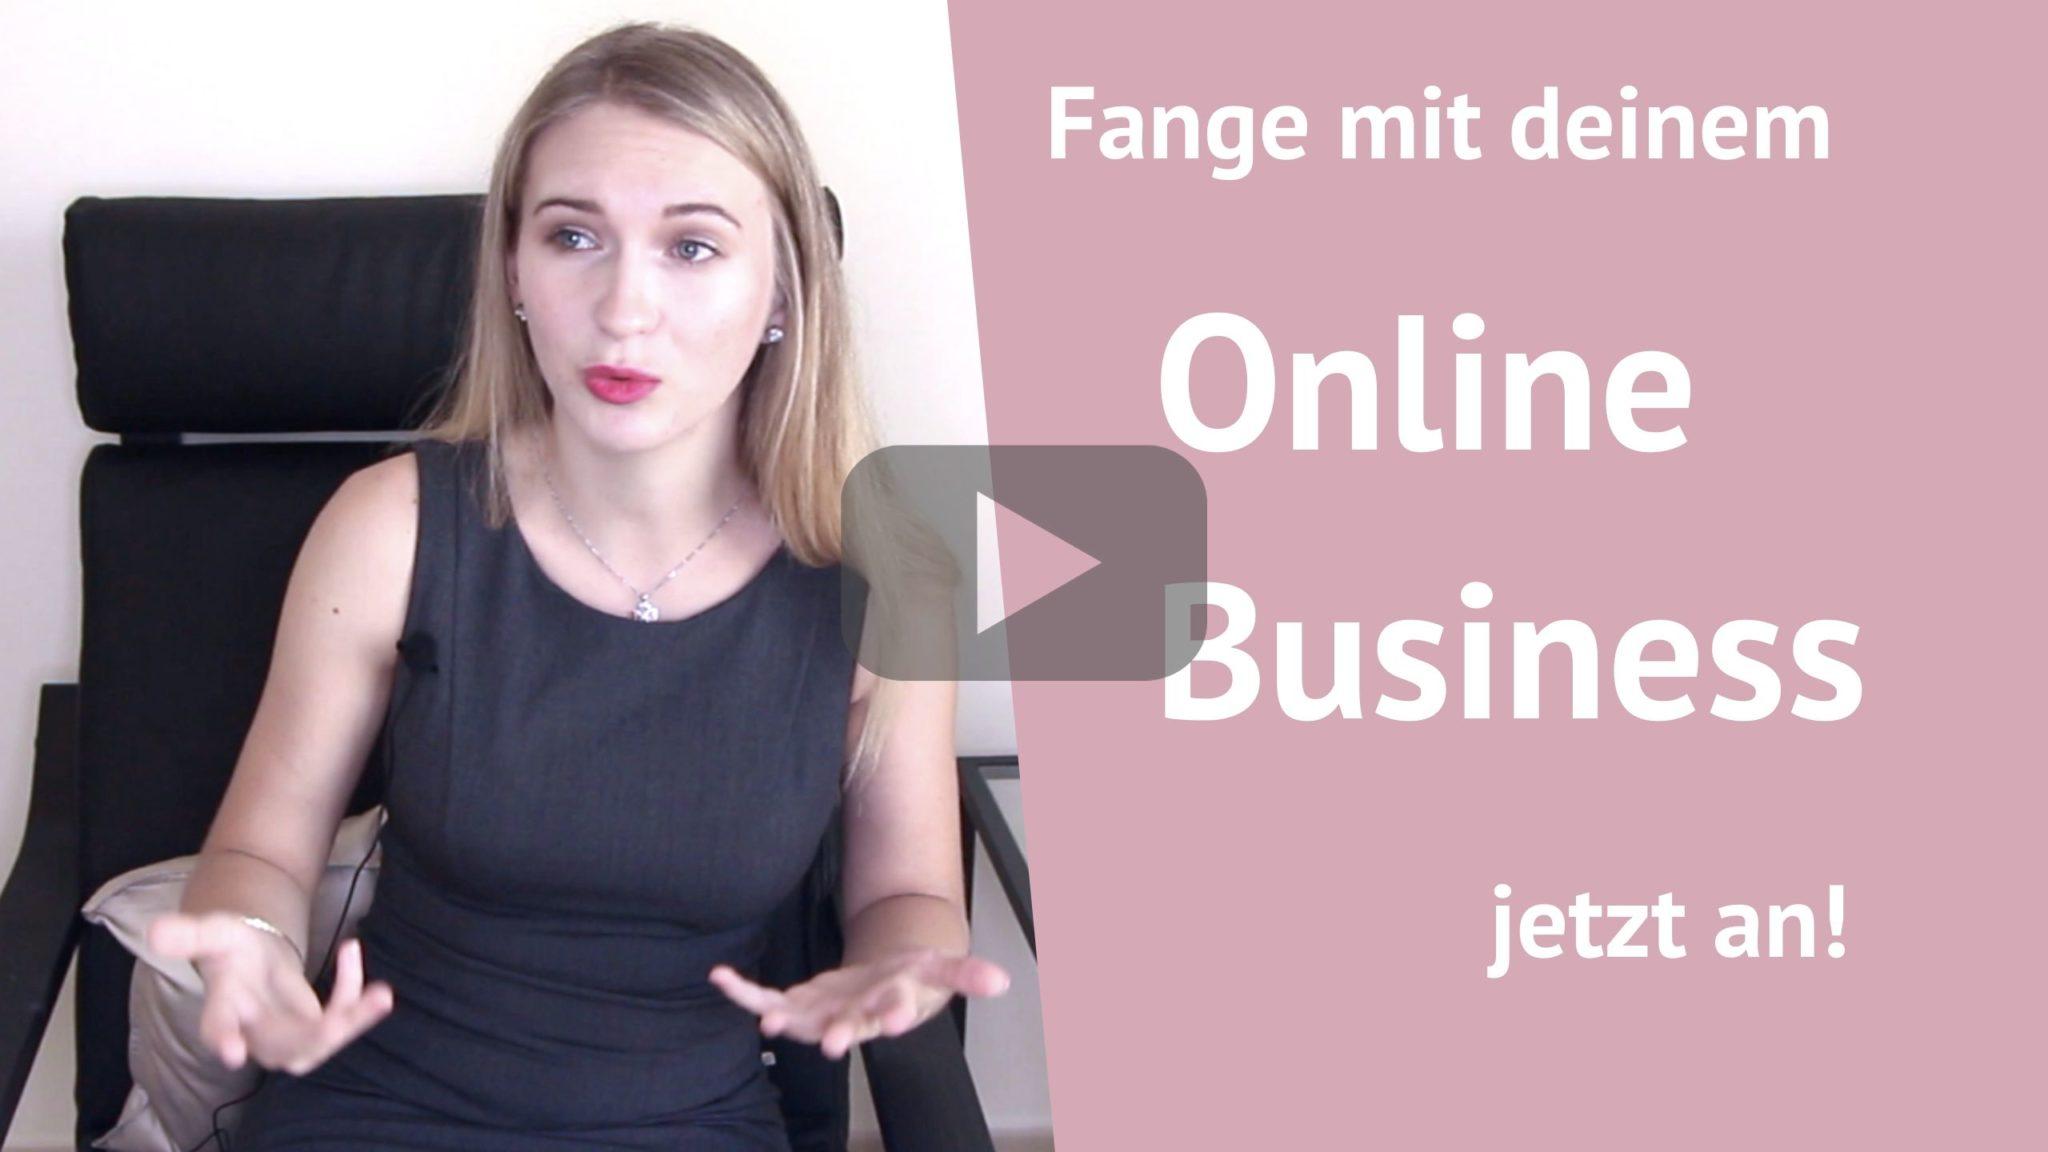 online business anfangen